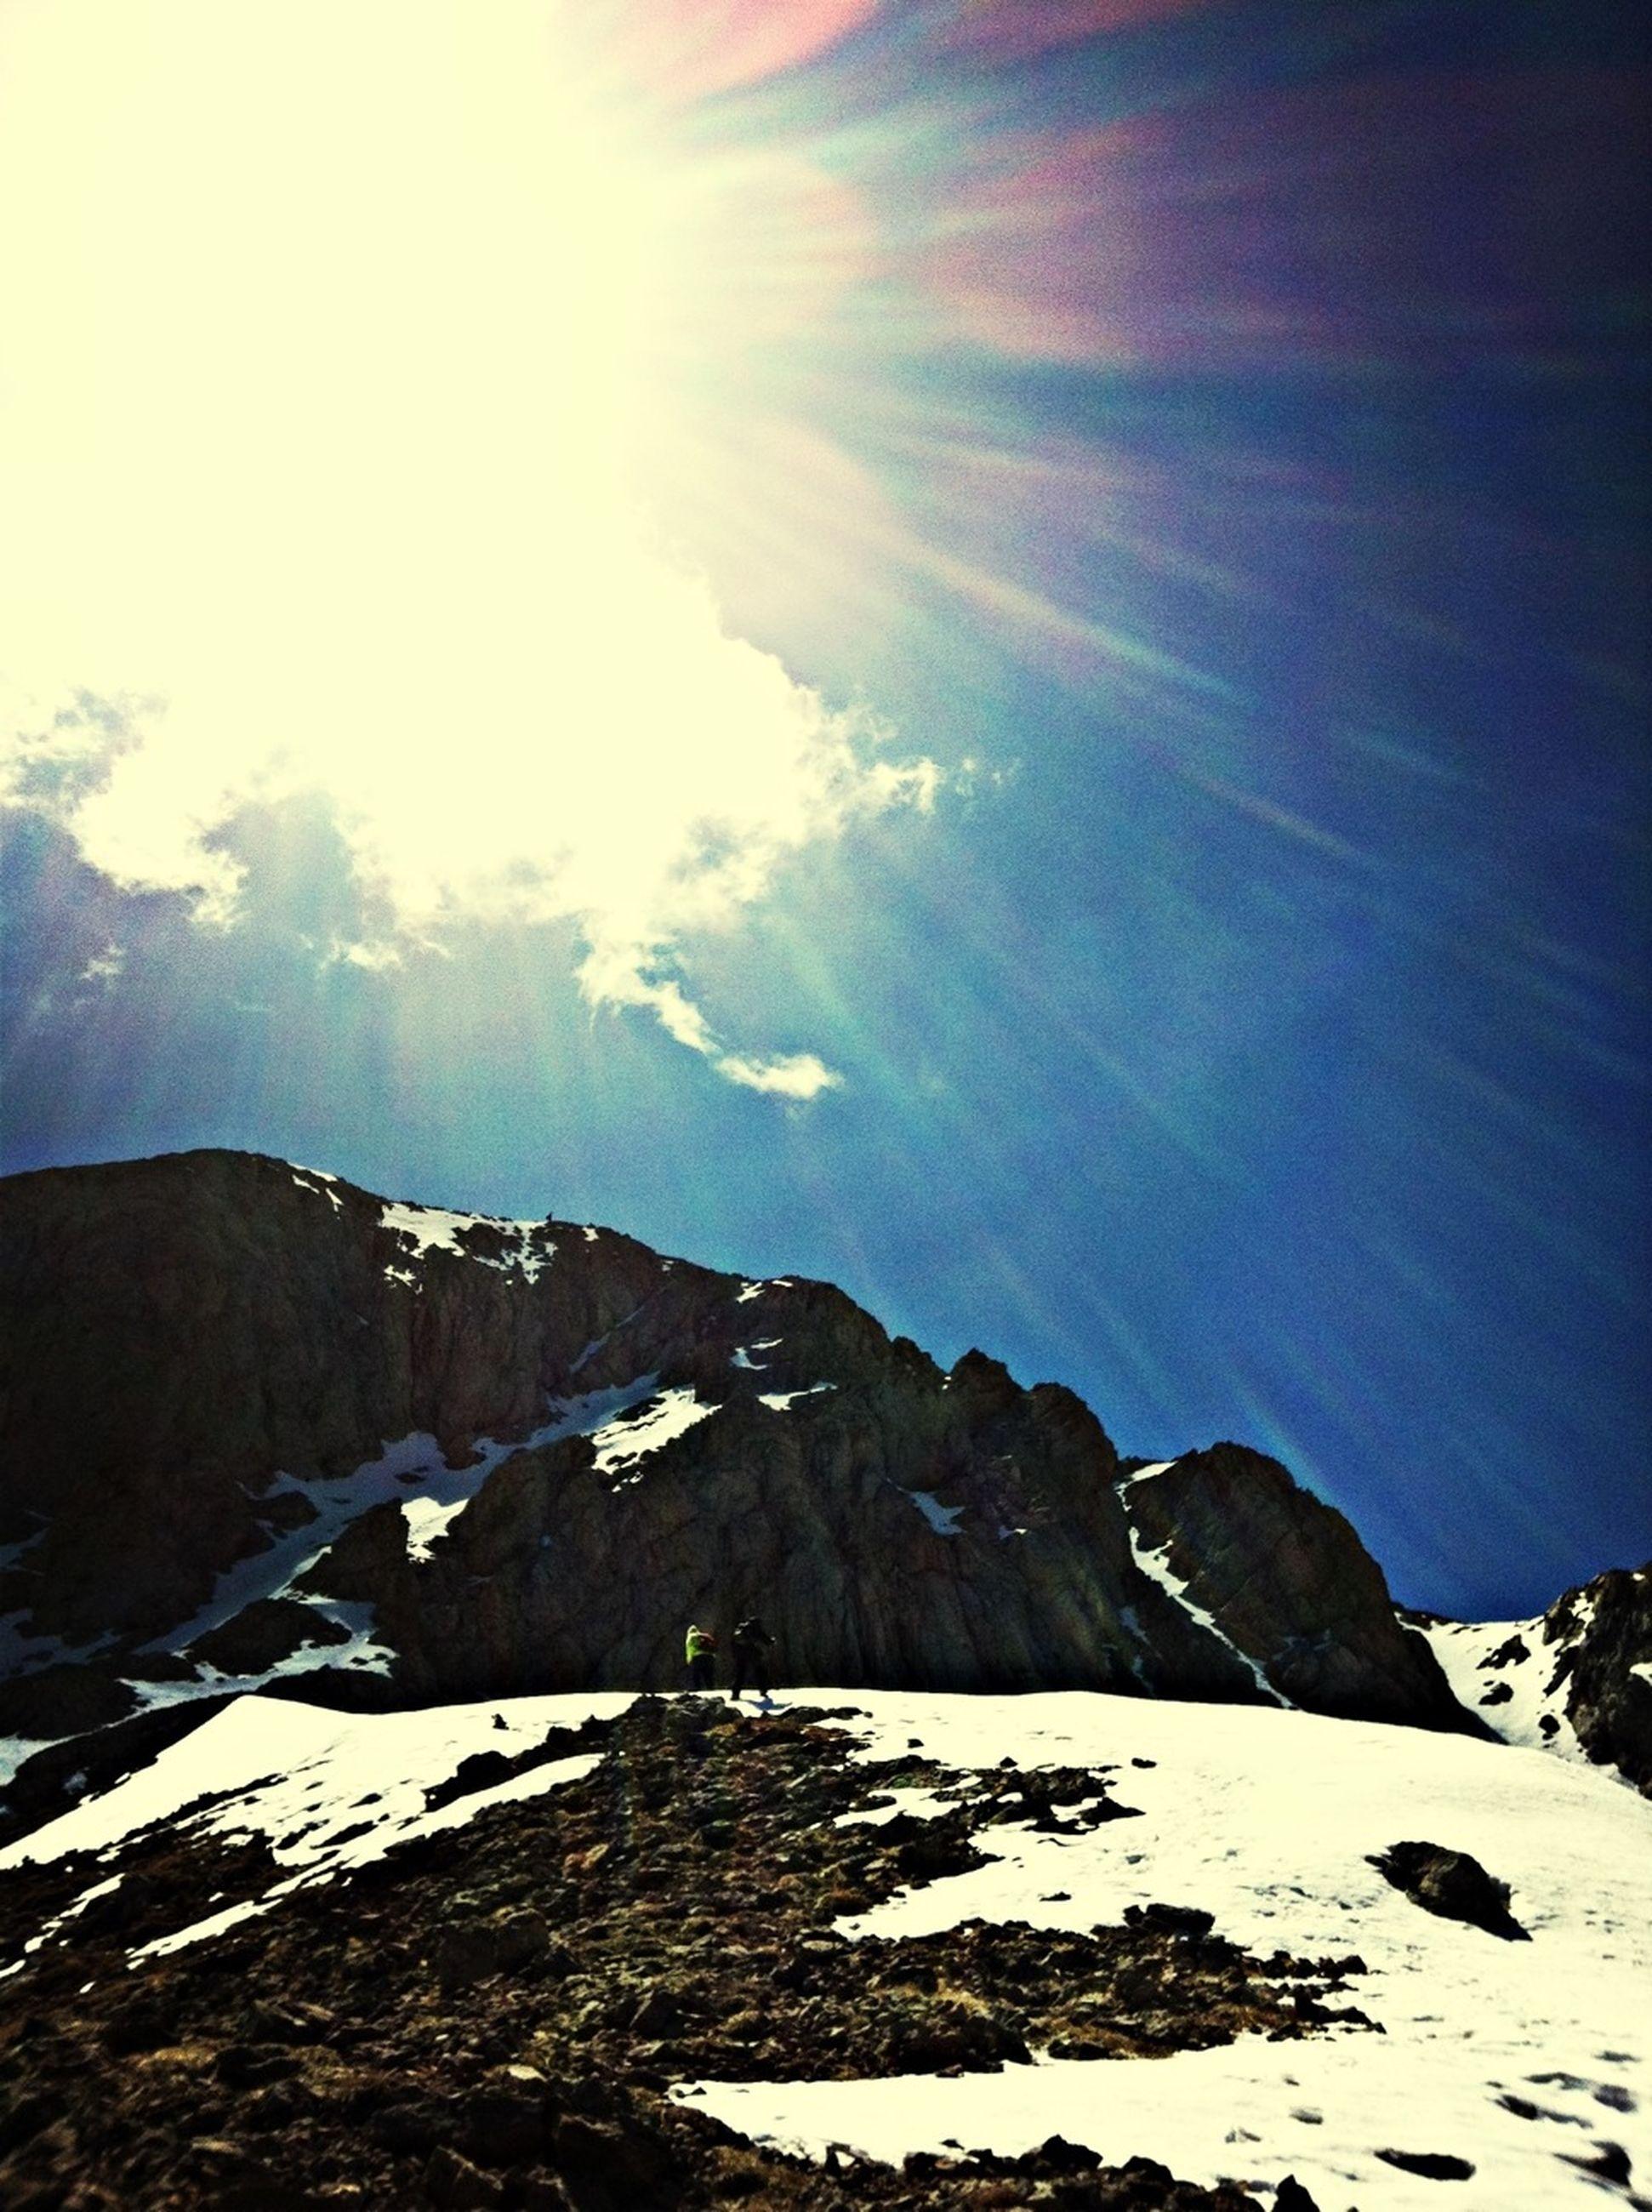 mountain, snow, tranquil scene, sky, tranquility, scenics, winter, beauty in nature, nature, cold temperature, mountain range, sunlight, landscape, cloud - sky, weather, sun, season, idyllic, non-urban scene, snowcapped mountain